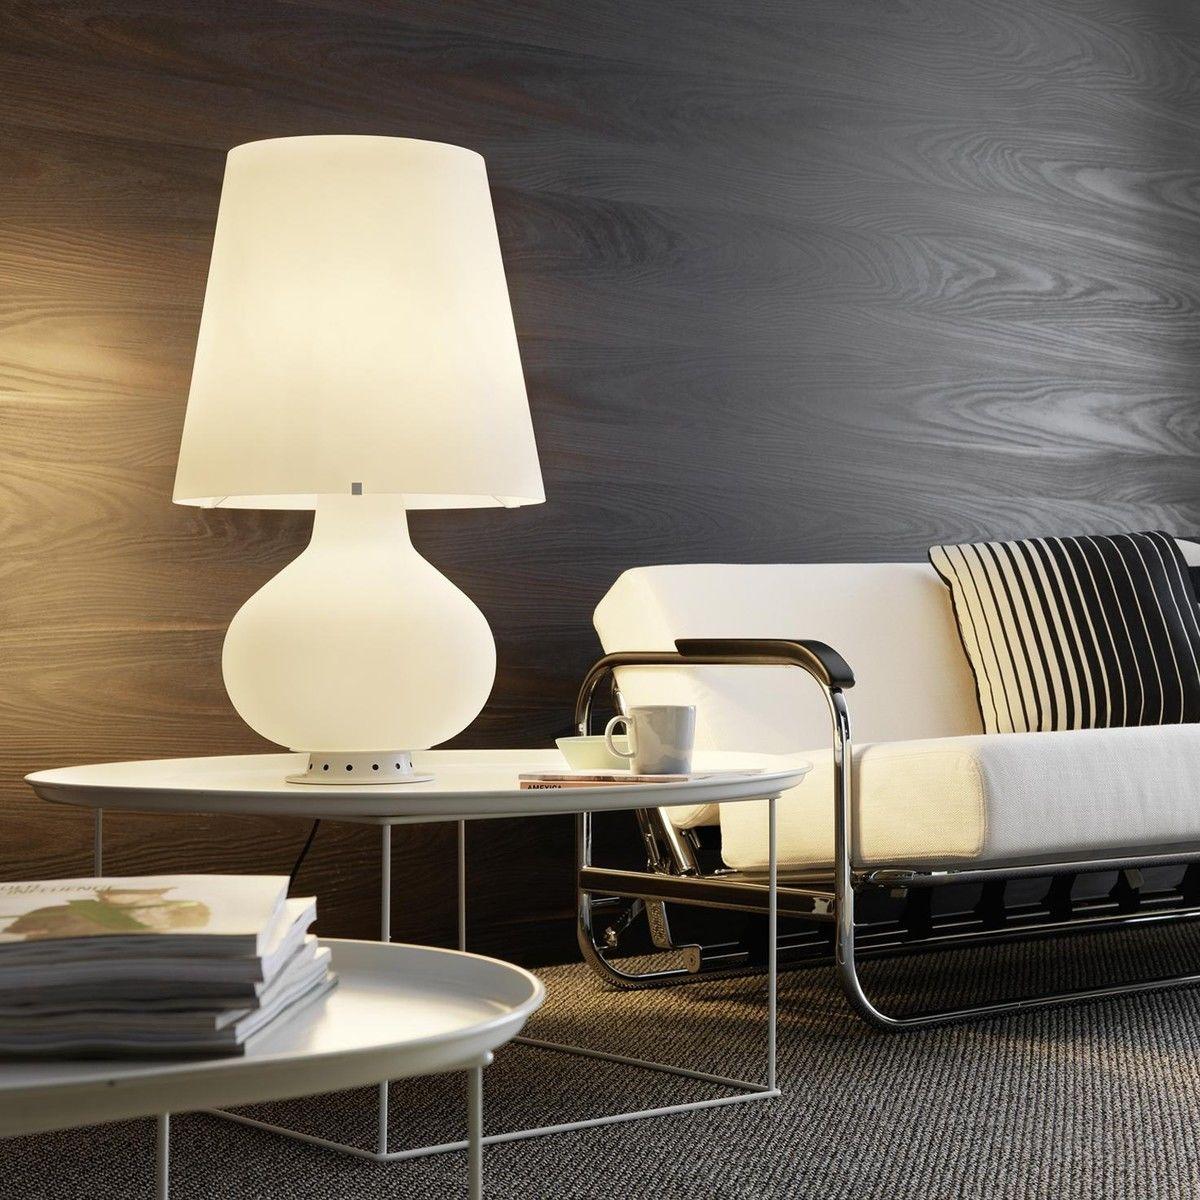 fontana 1853 grande table lamp fontana arte. Black Bedroom Furniture Sets. Home Design Ideas